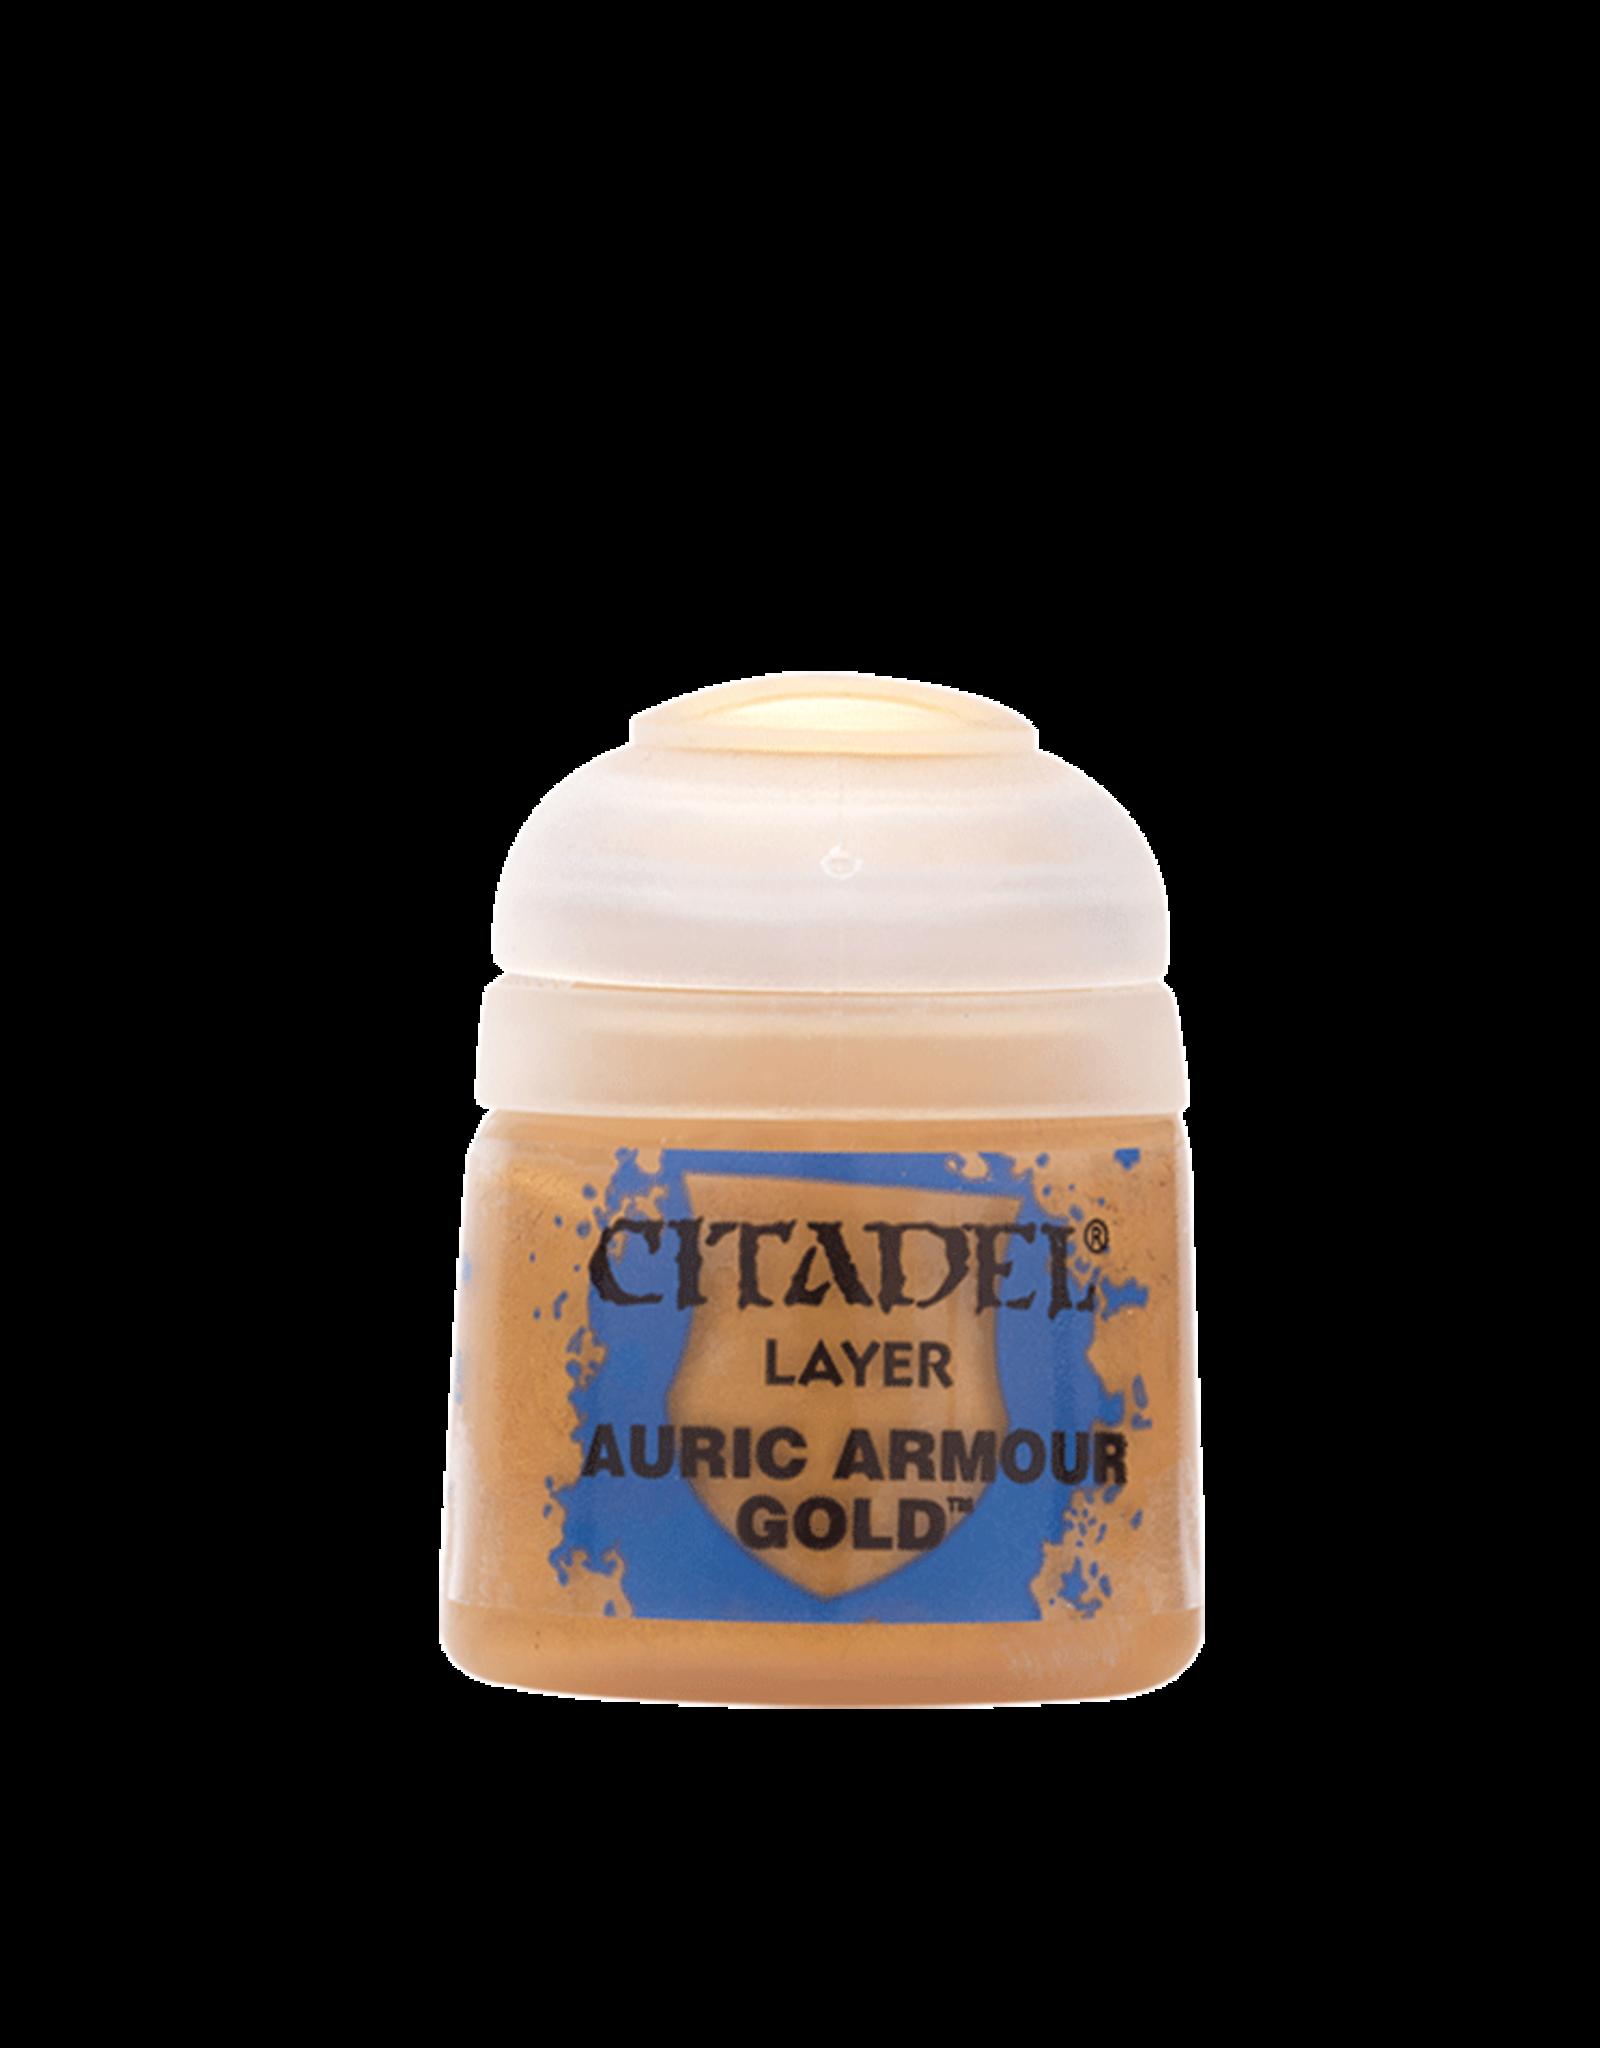 Citadel Citadel Layer: Auric Armour Gold (12ml)